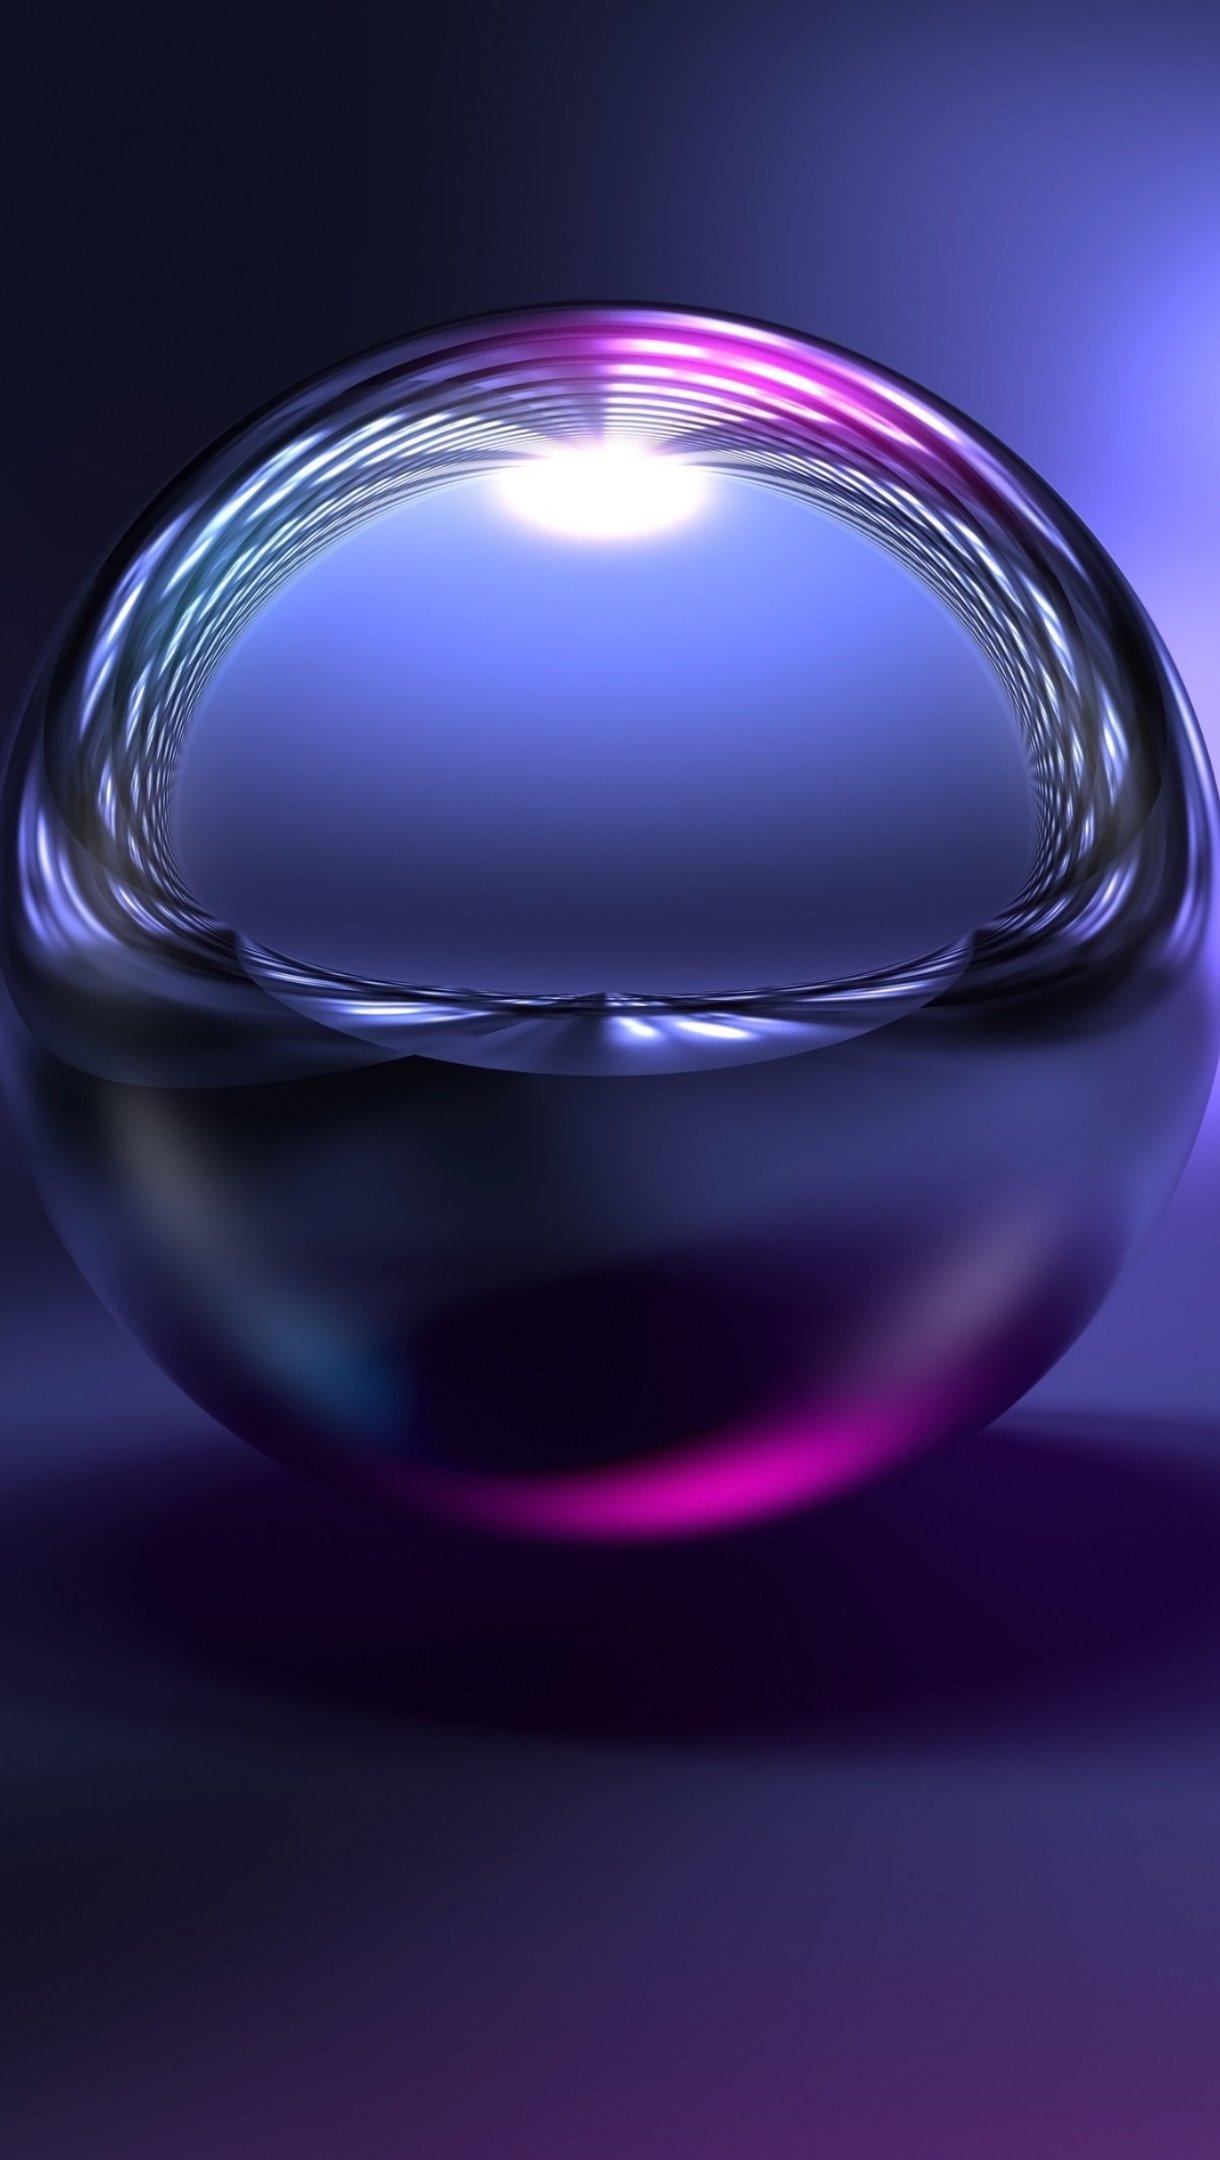 Wallpaper Reflections in metal ball Vertical